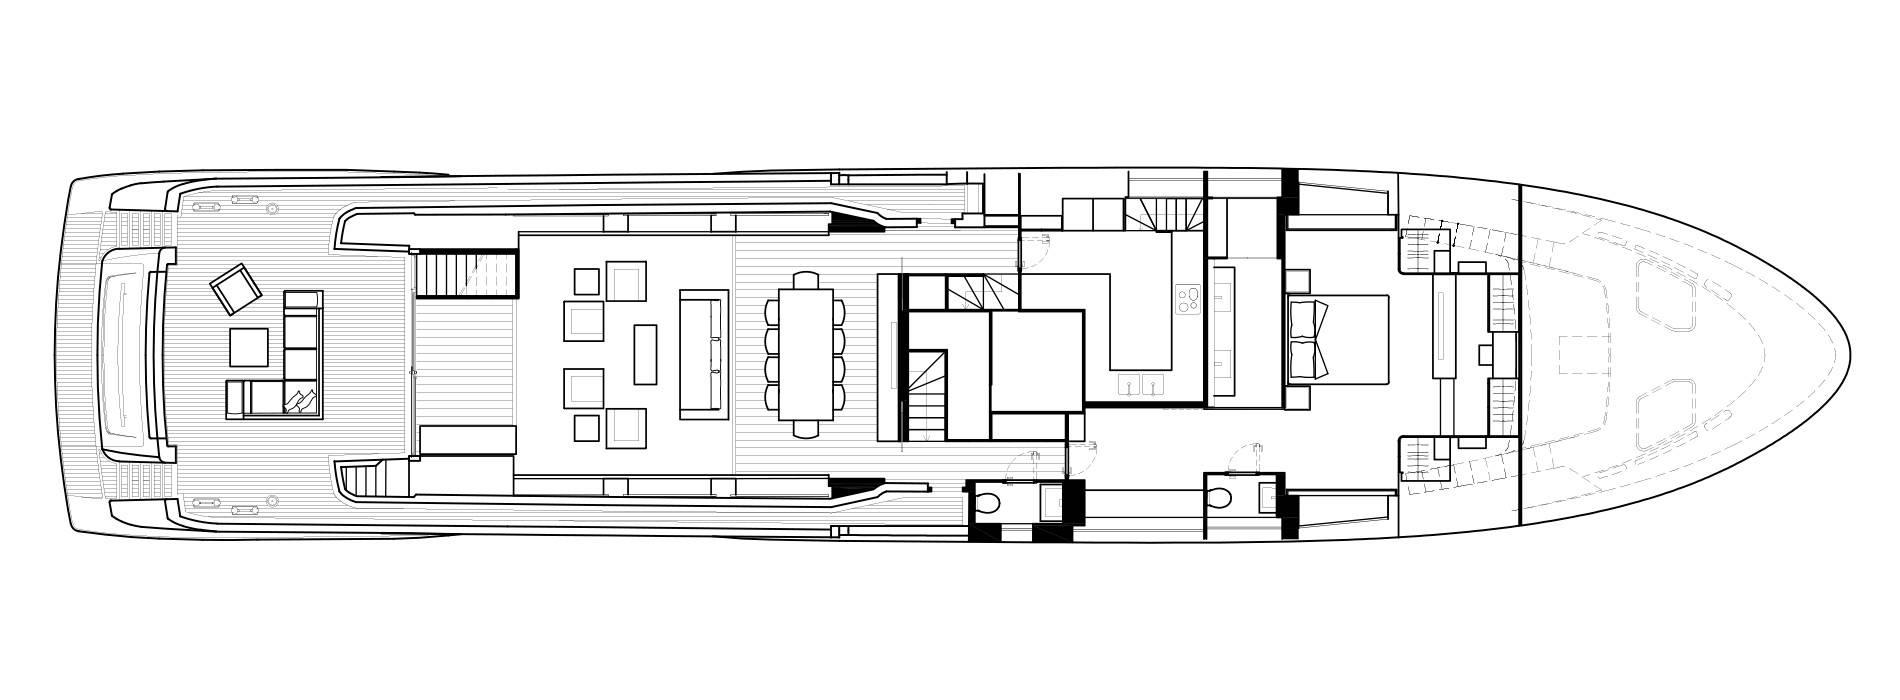 Sanlorenzo Yachts SL118 Hauptdeck